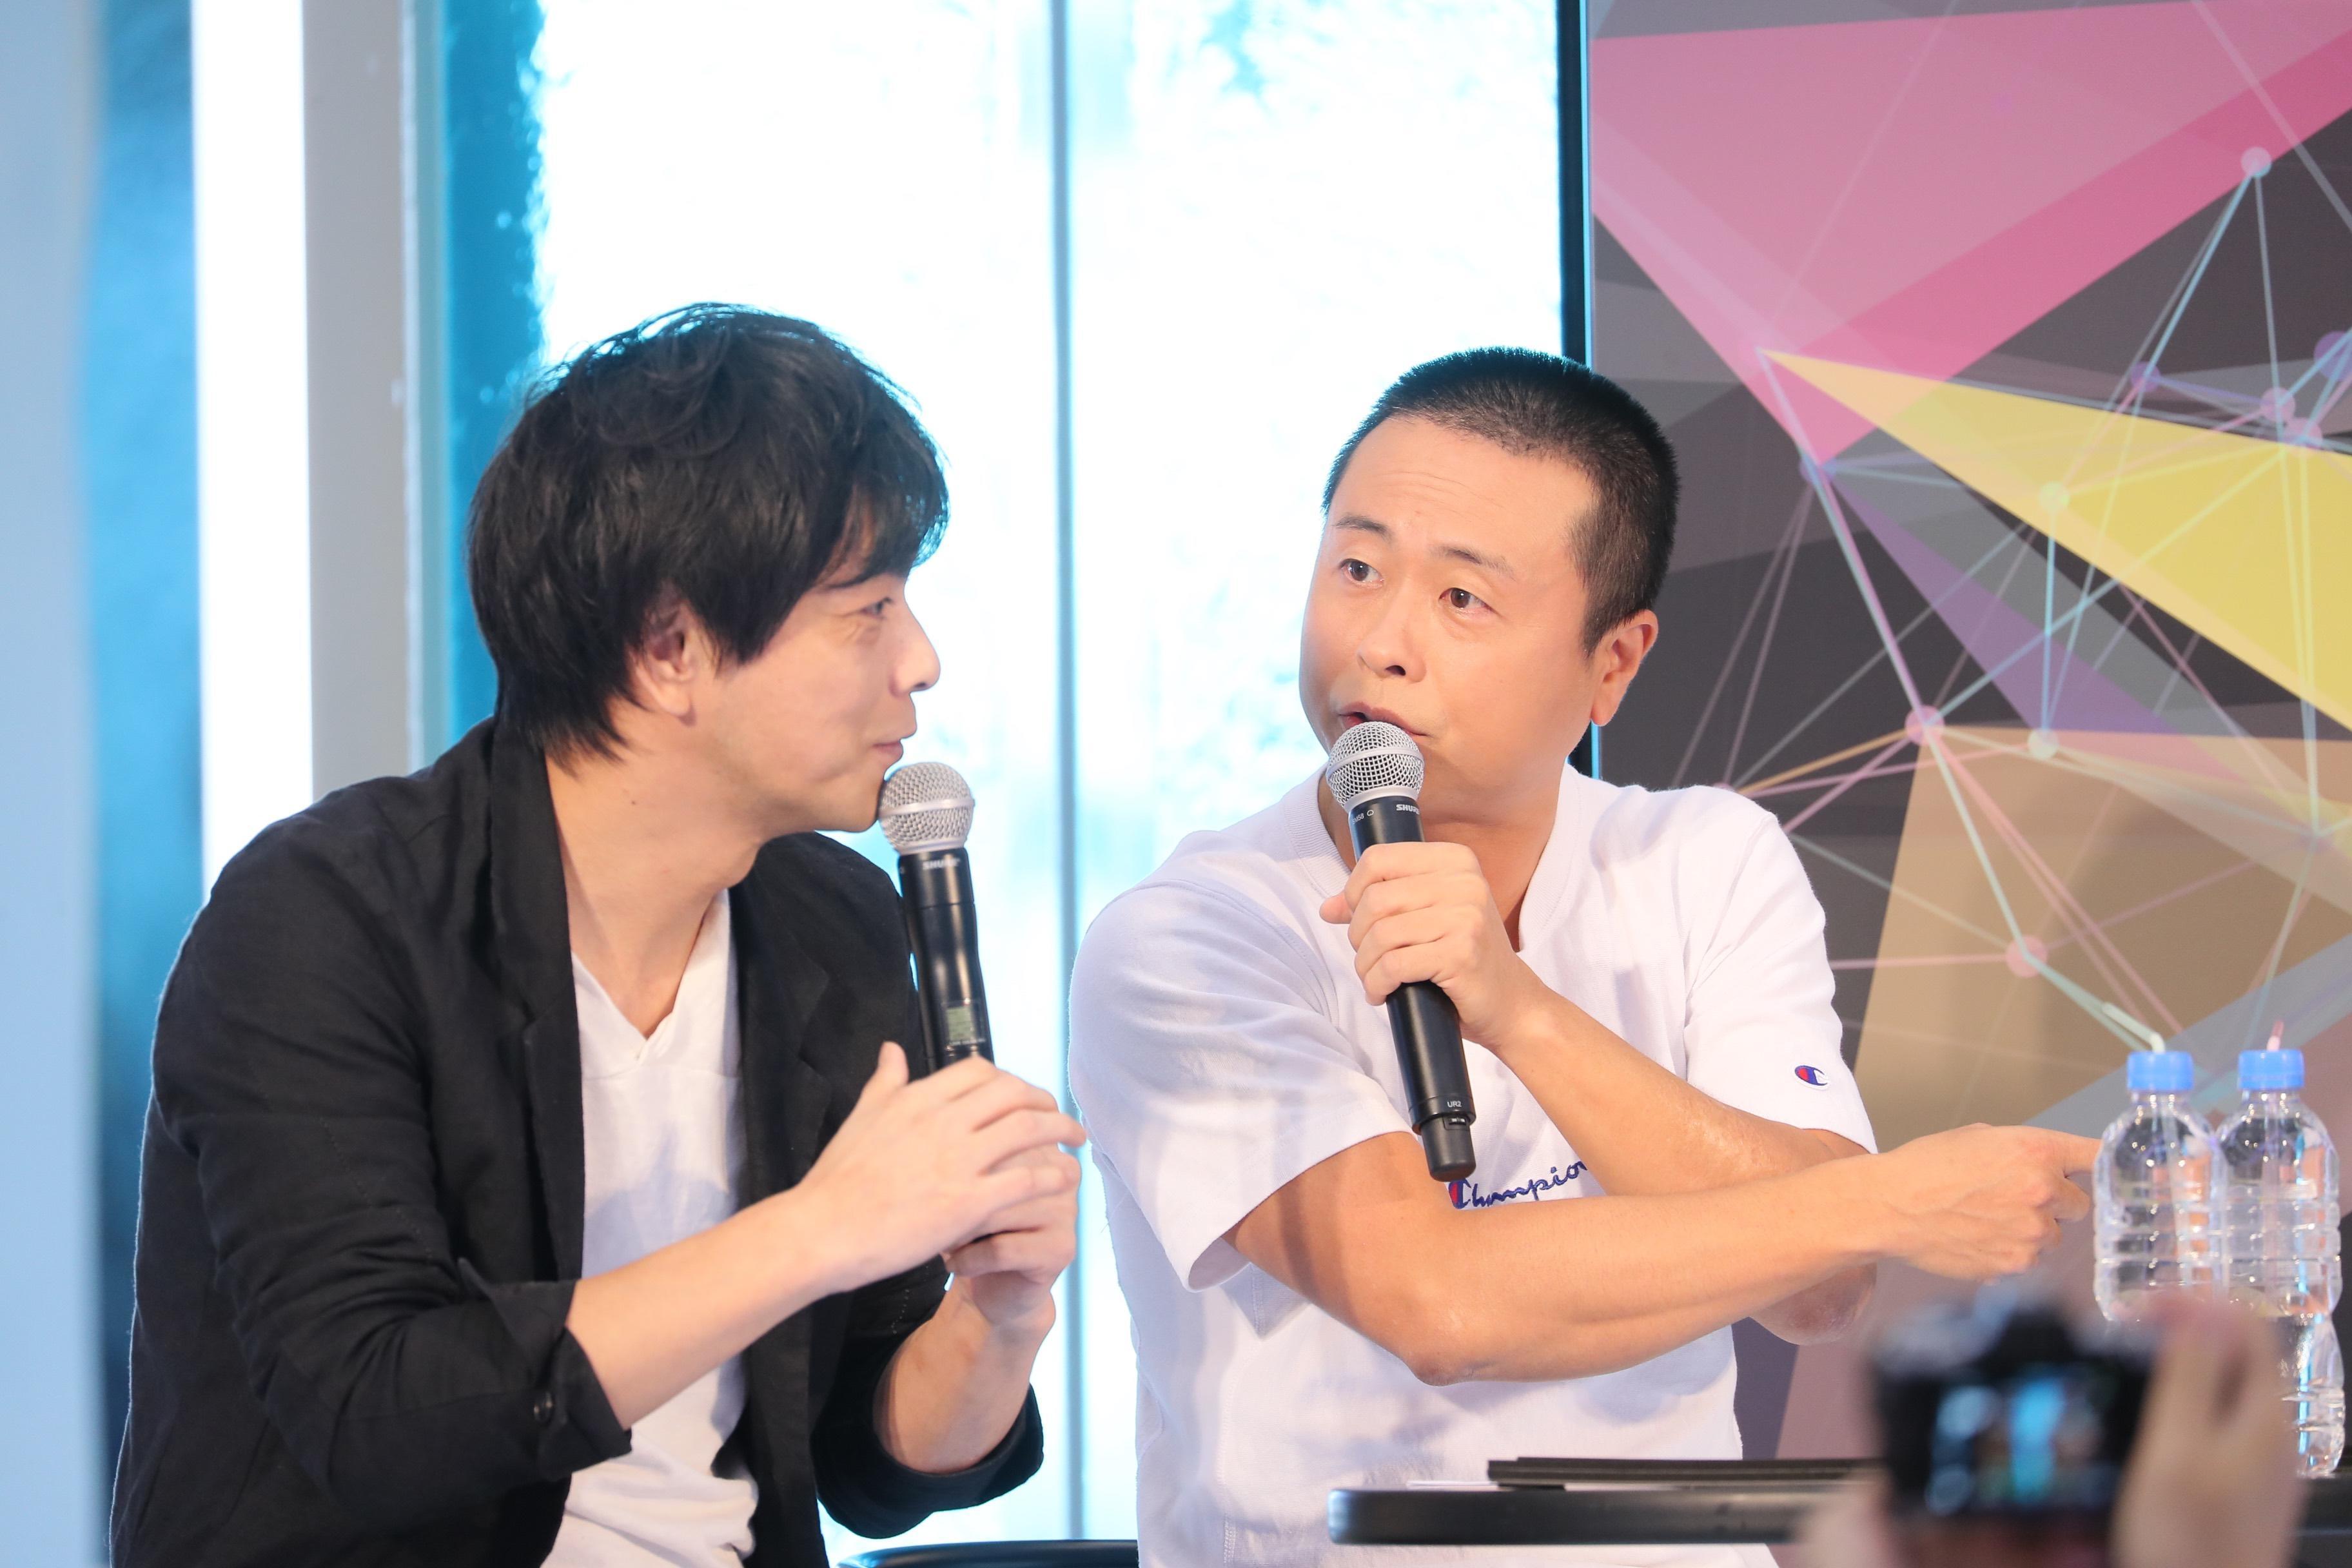 http://news.yoshimoto.co.jp/20180925045357-6885f31e00a32cdea406b7a0e0e1eb04c8009145.jpg